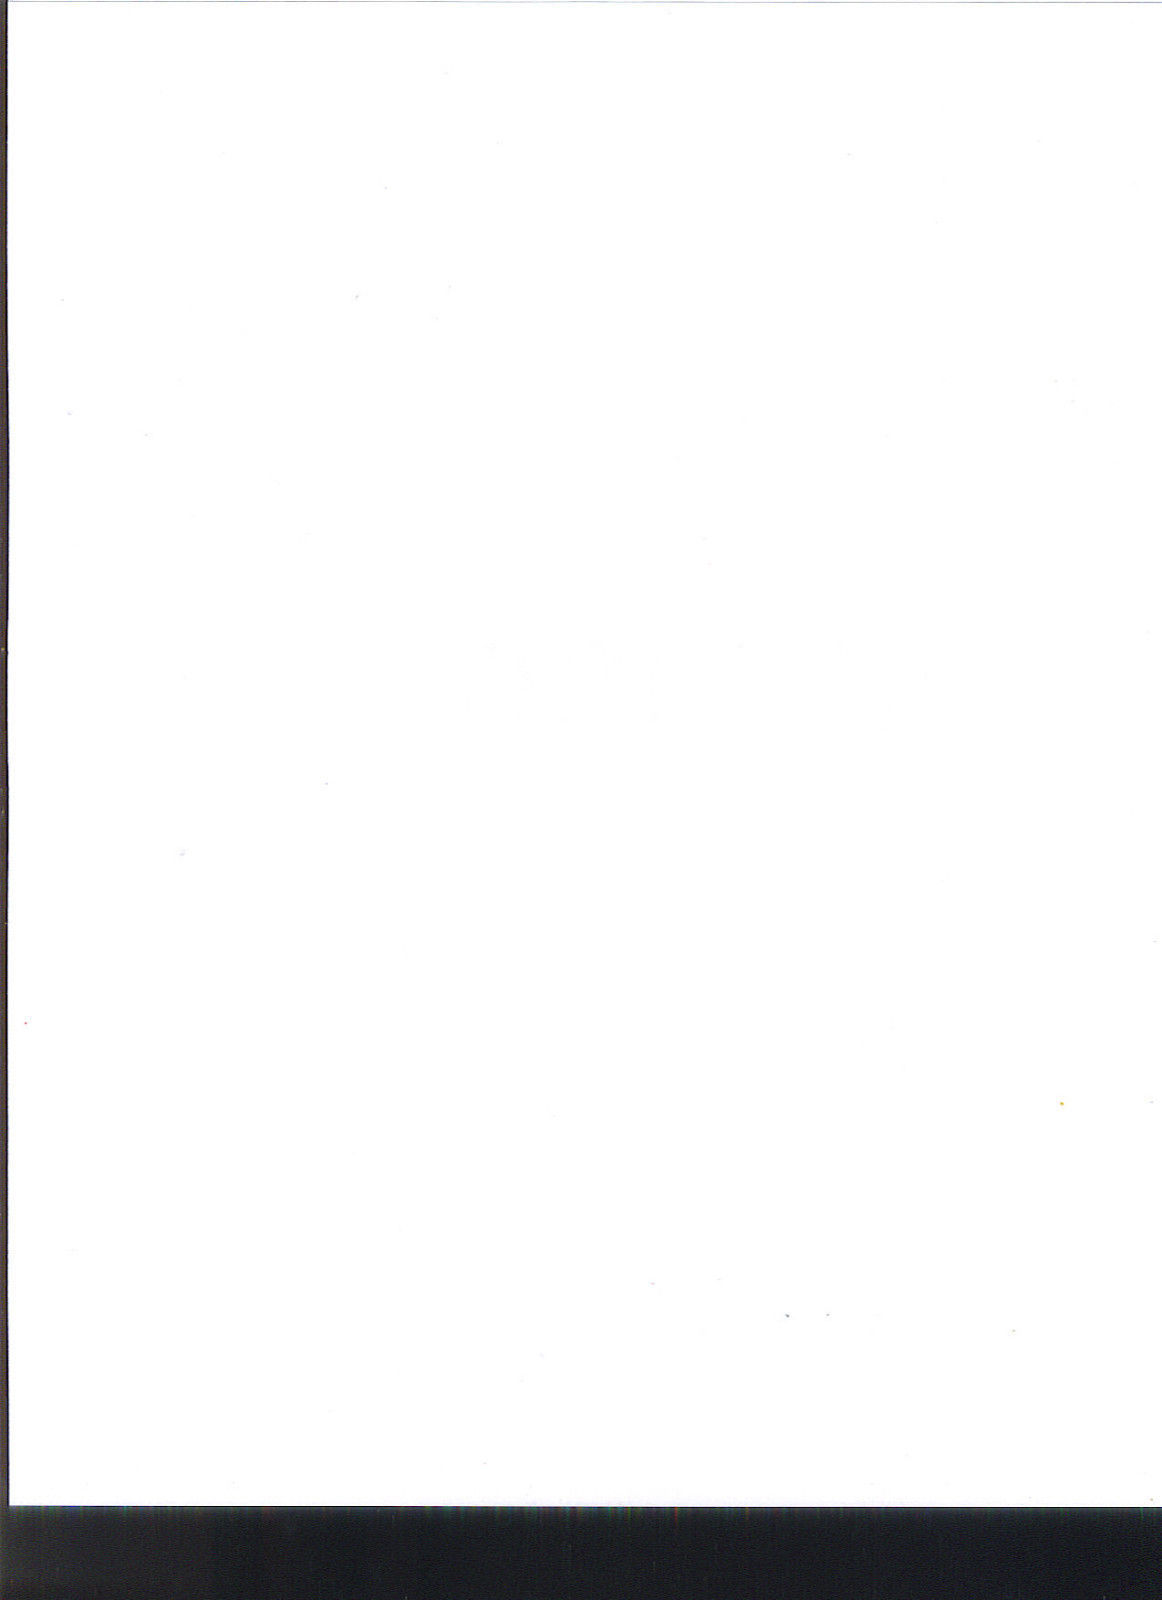 Donald TRUMP Loser Cover 2016 New York Mag TOVE LO Jeremy LIN Morning JOE